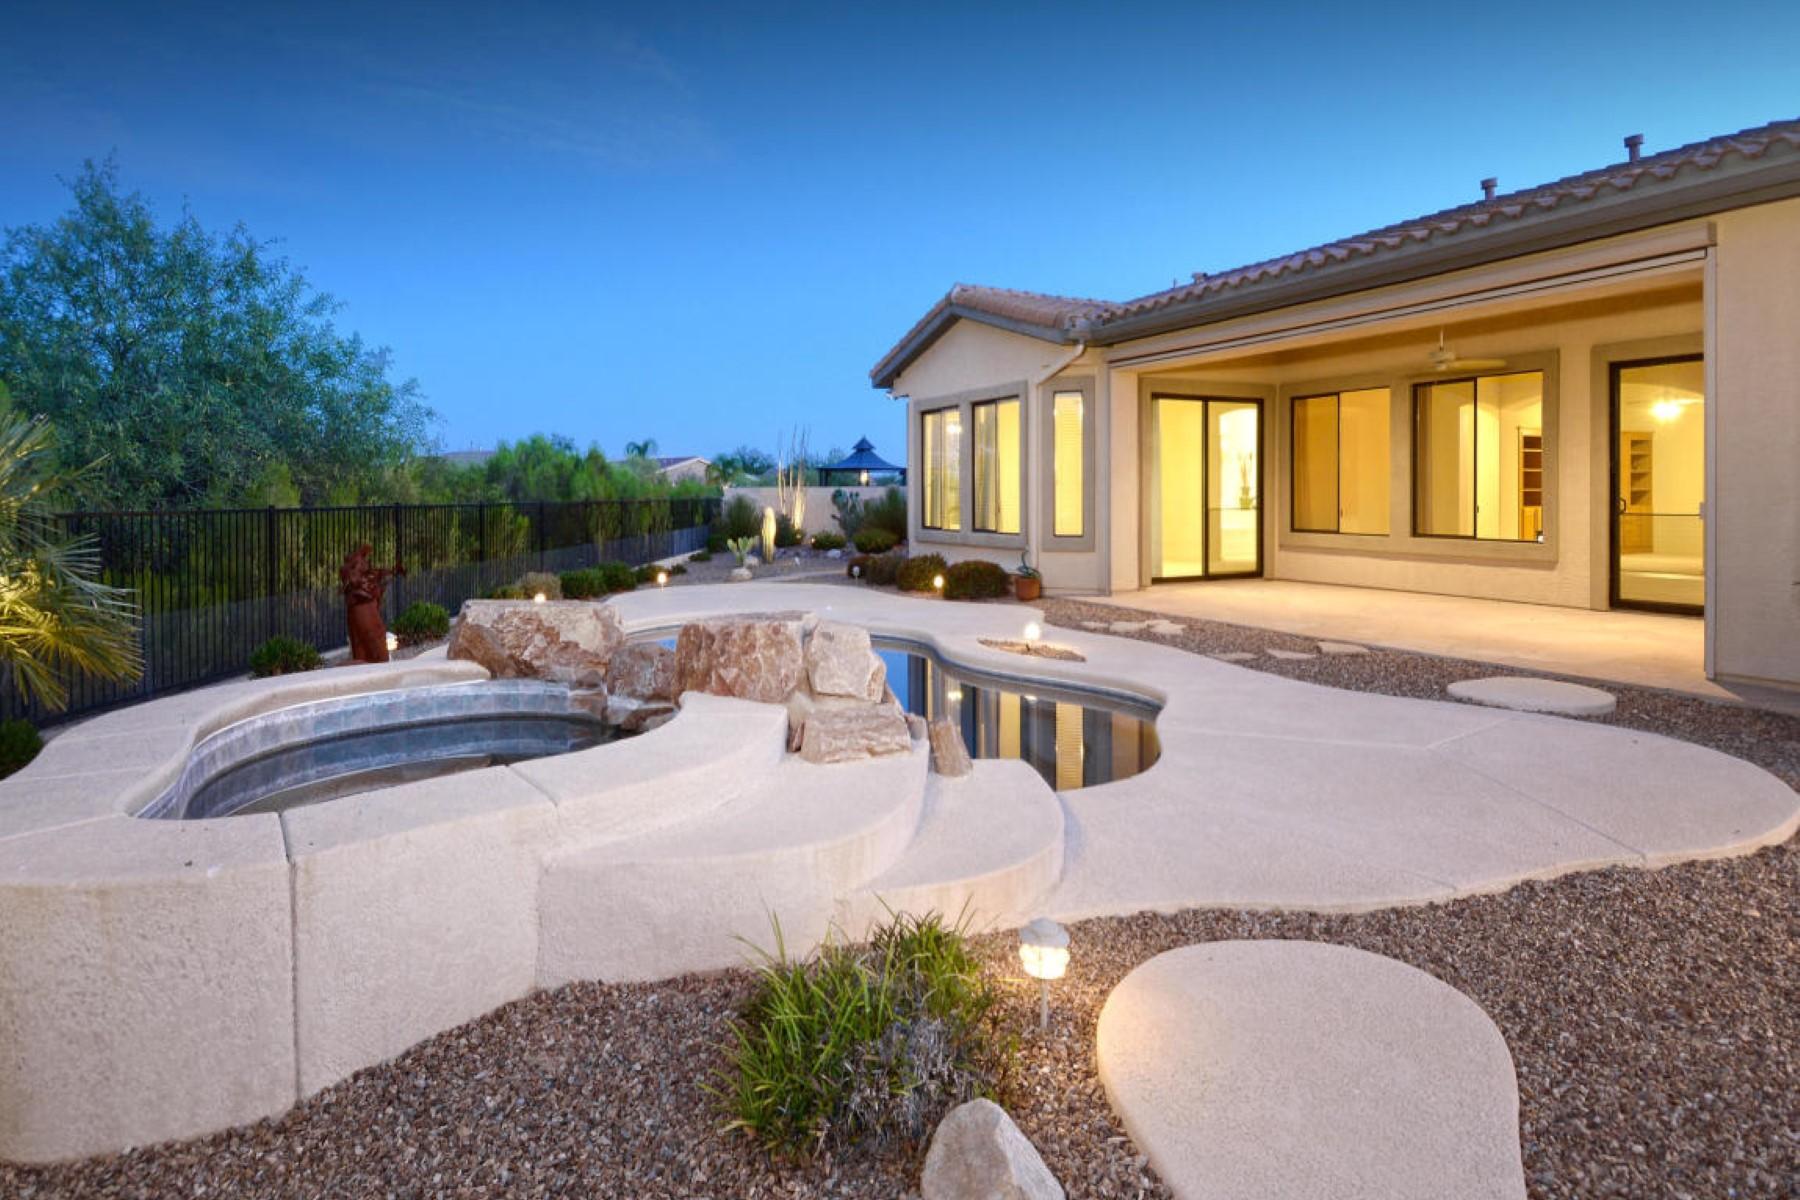 Moradia para Venda às Oro valley dream amazing home on premium east facing lot 11964 N THORNBUSH Drive Oro Valley, Arizona 85737 Estados Unidos